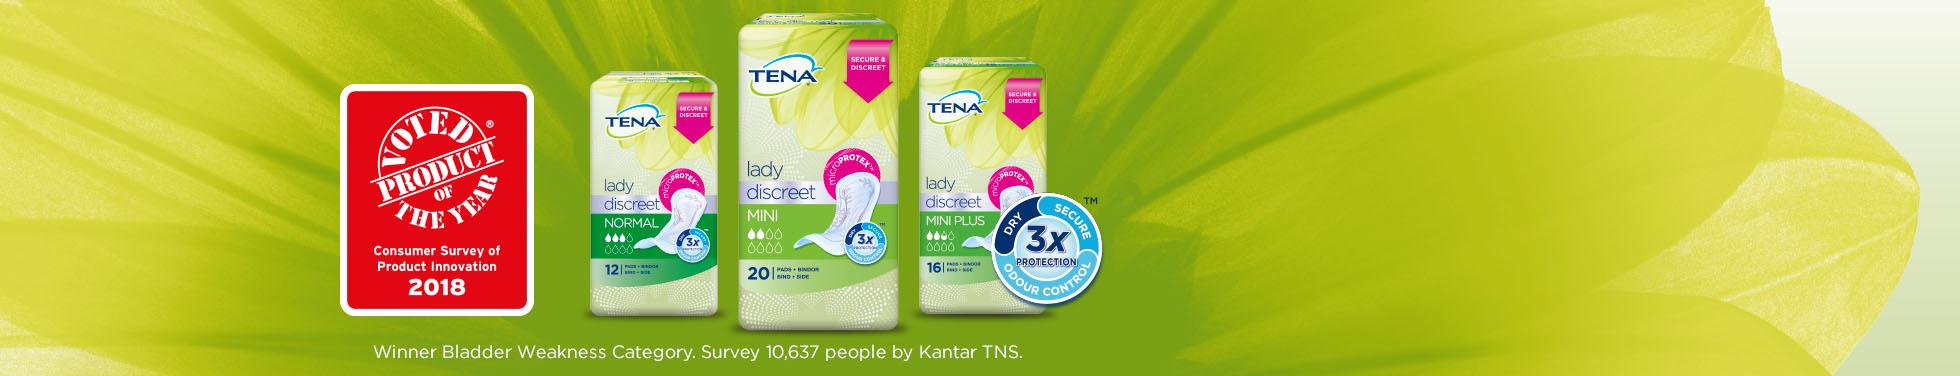 8875 TENA Lady Discreet POTY Web Assets V3Banner.jpg